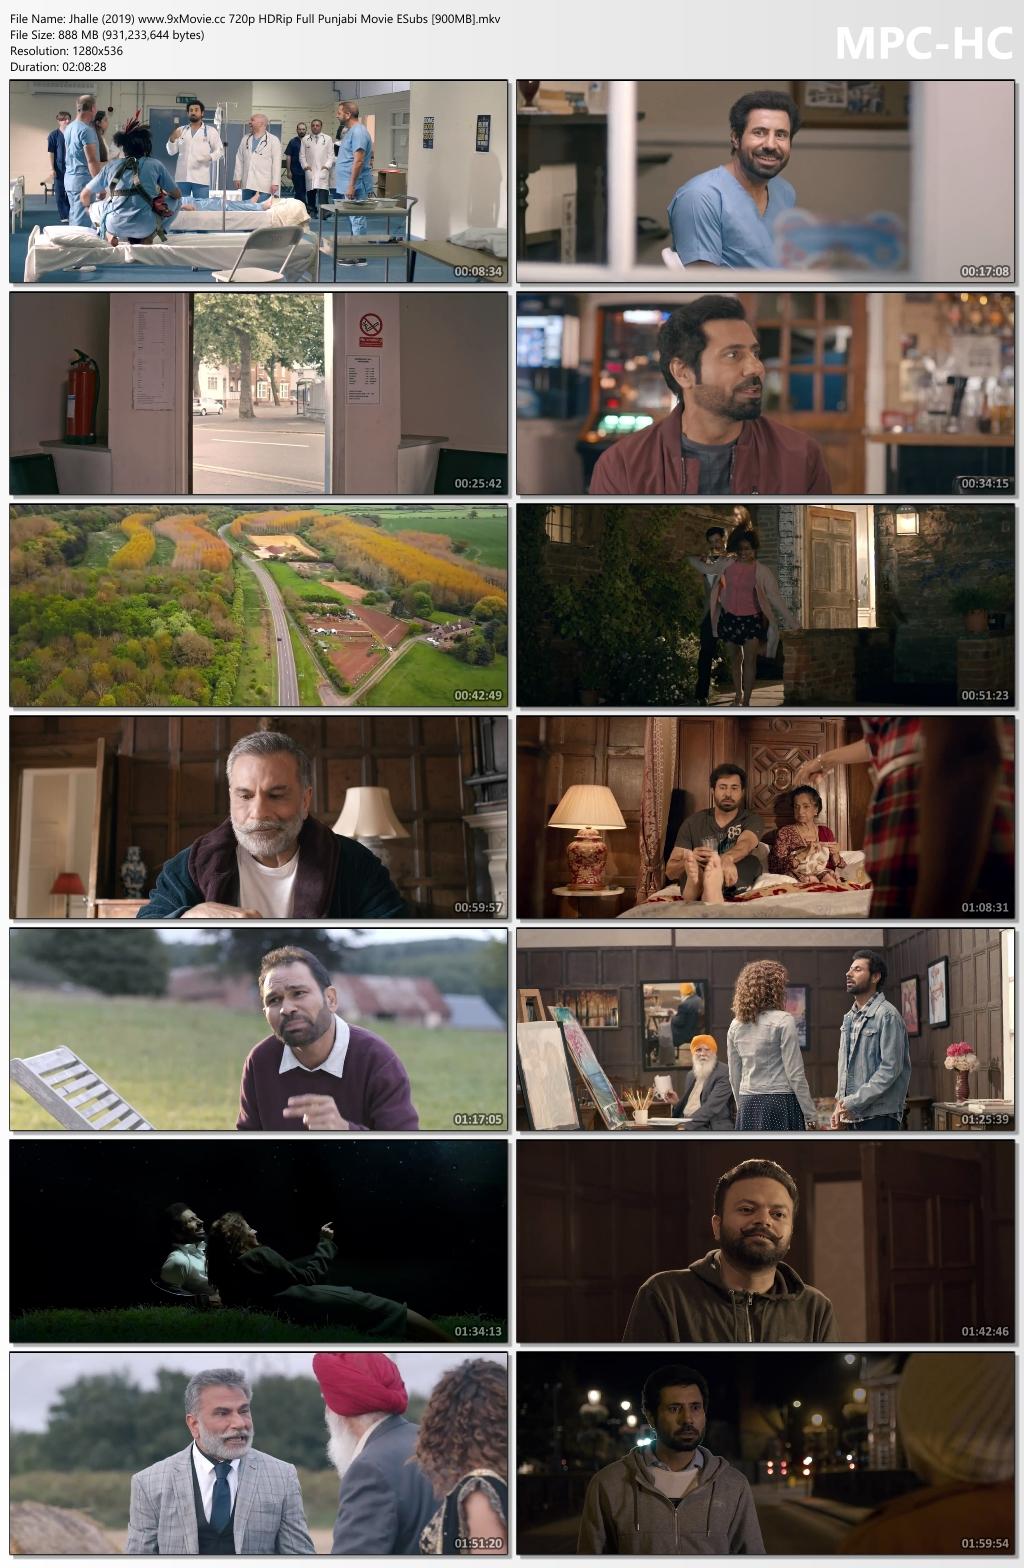 Jhalle-2019-www-9x-Movie-cc-720p-HDRip-Full-Punjabi-Movie-ESubs-900-MB-mkv